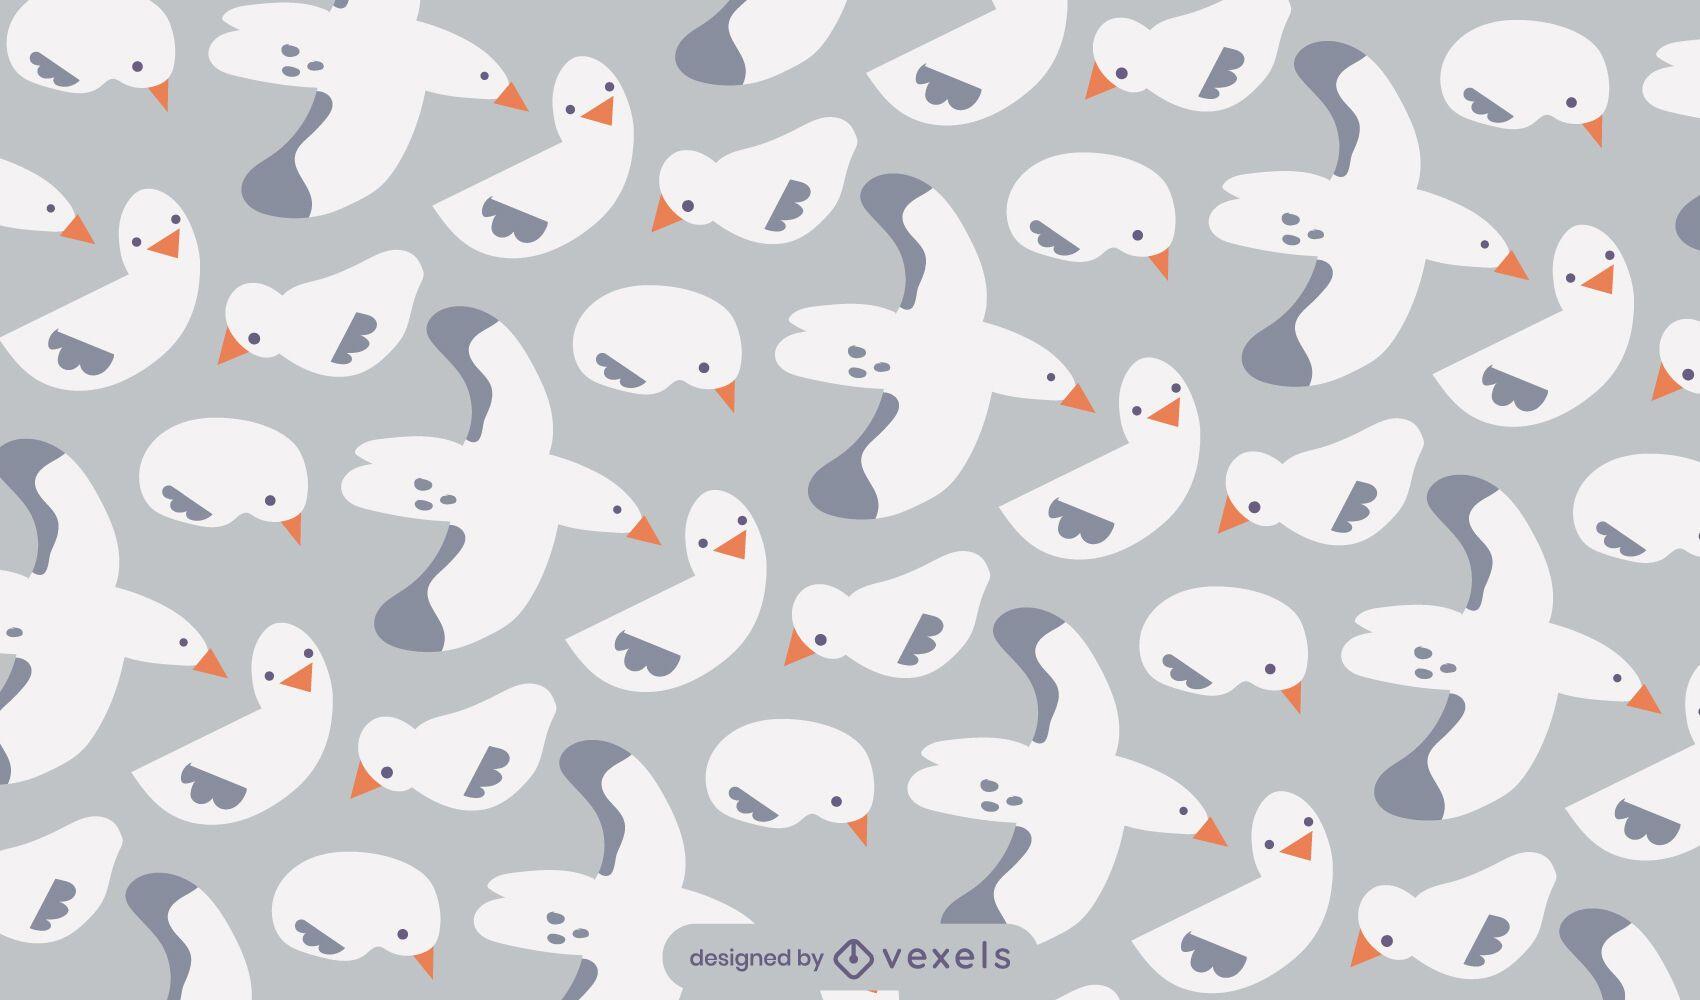 Seagull bird animal flying pattern design